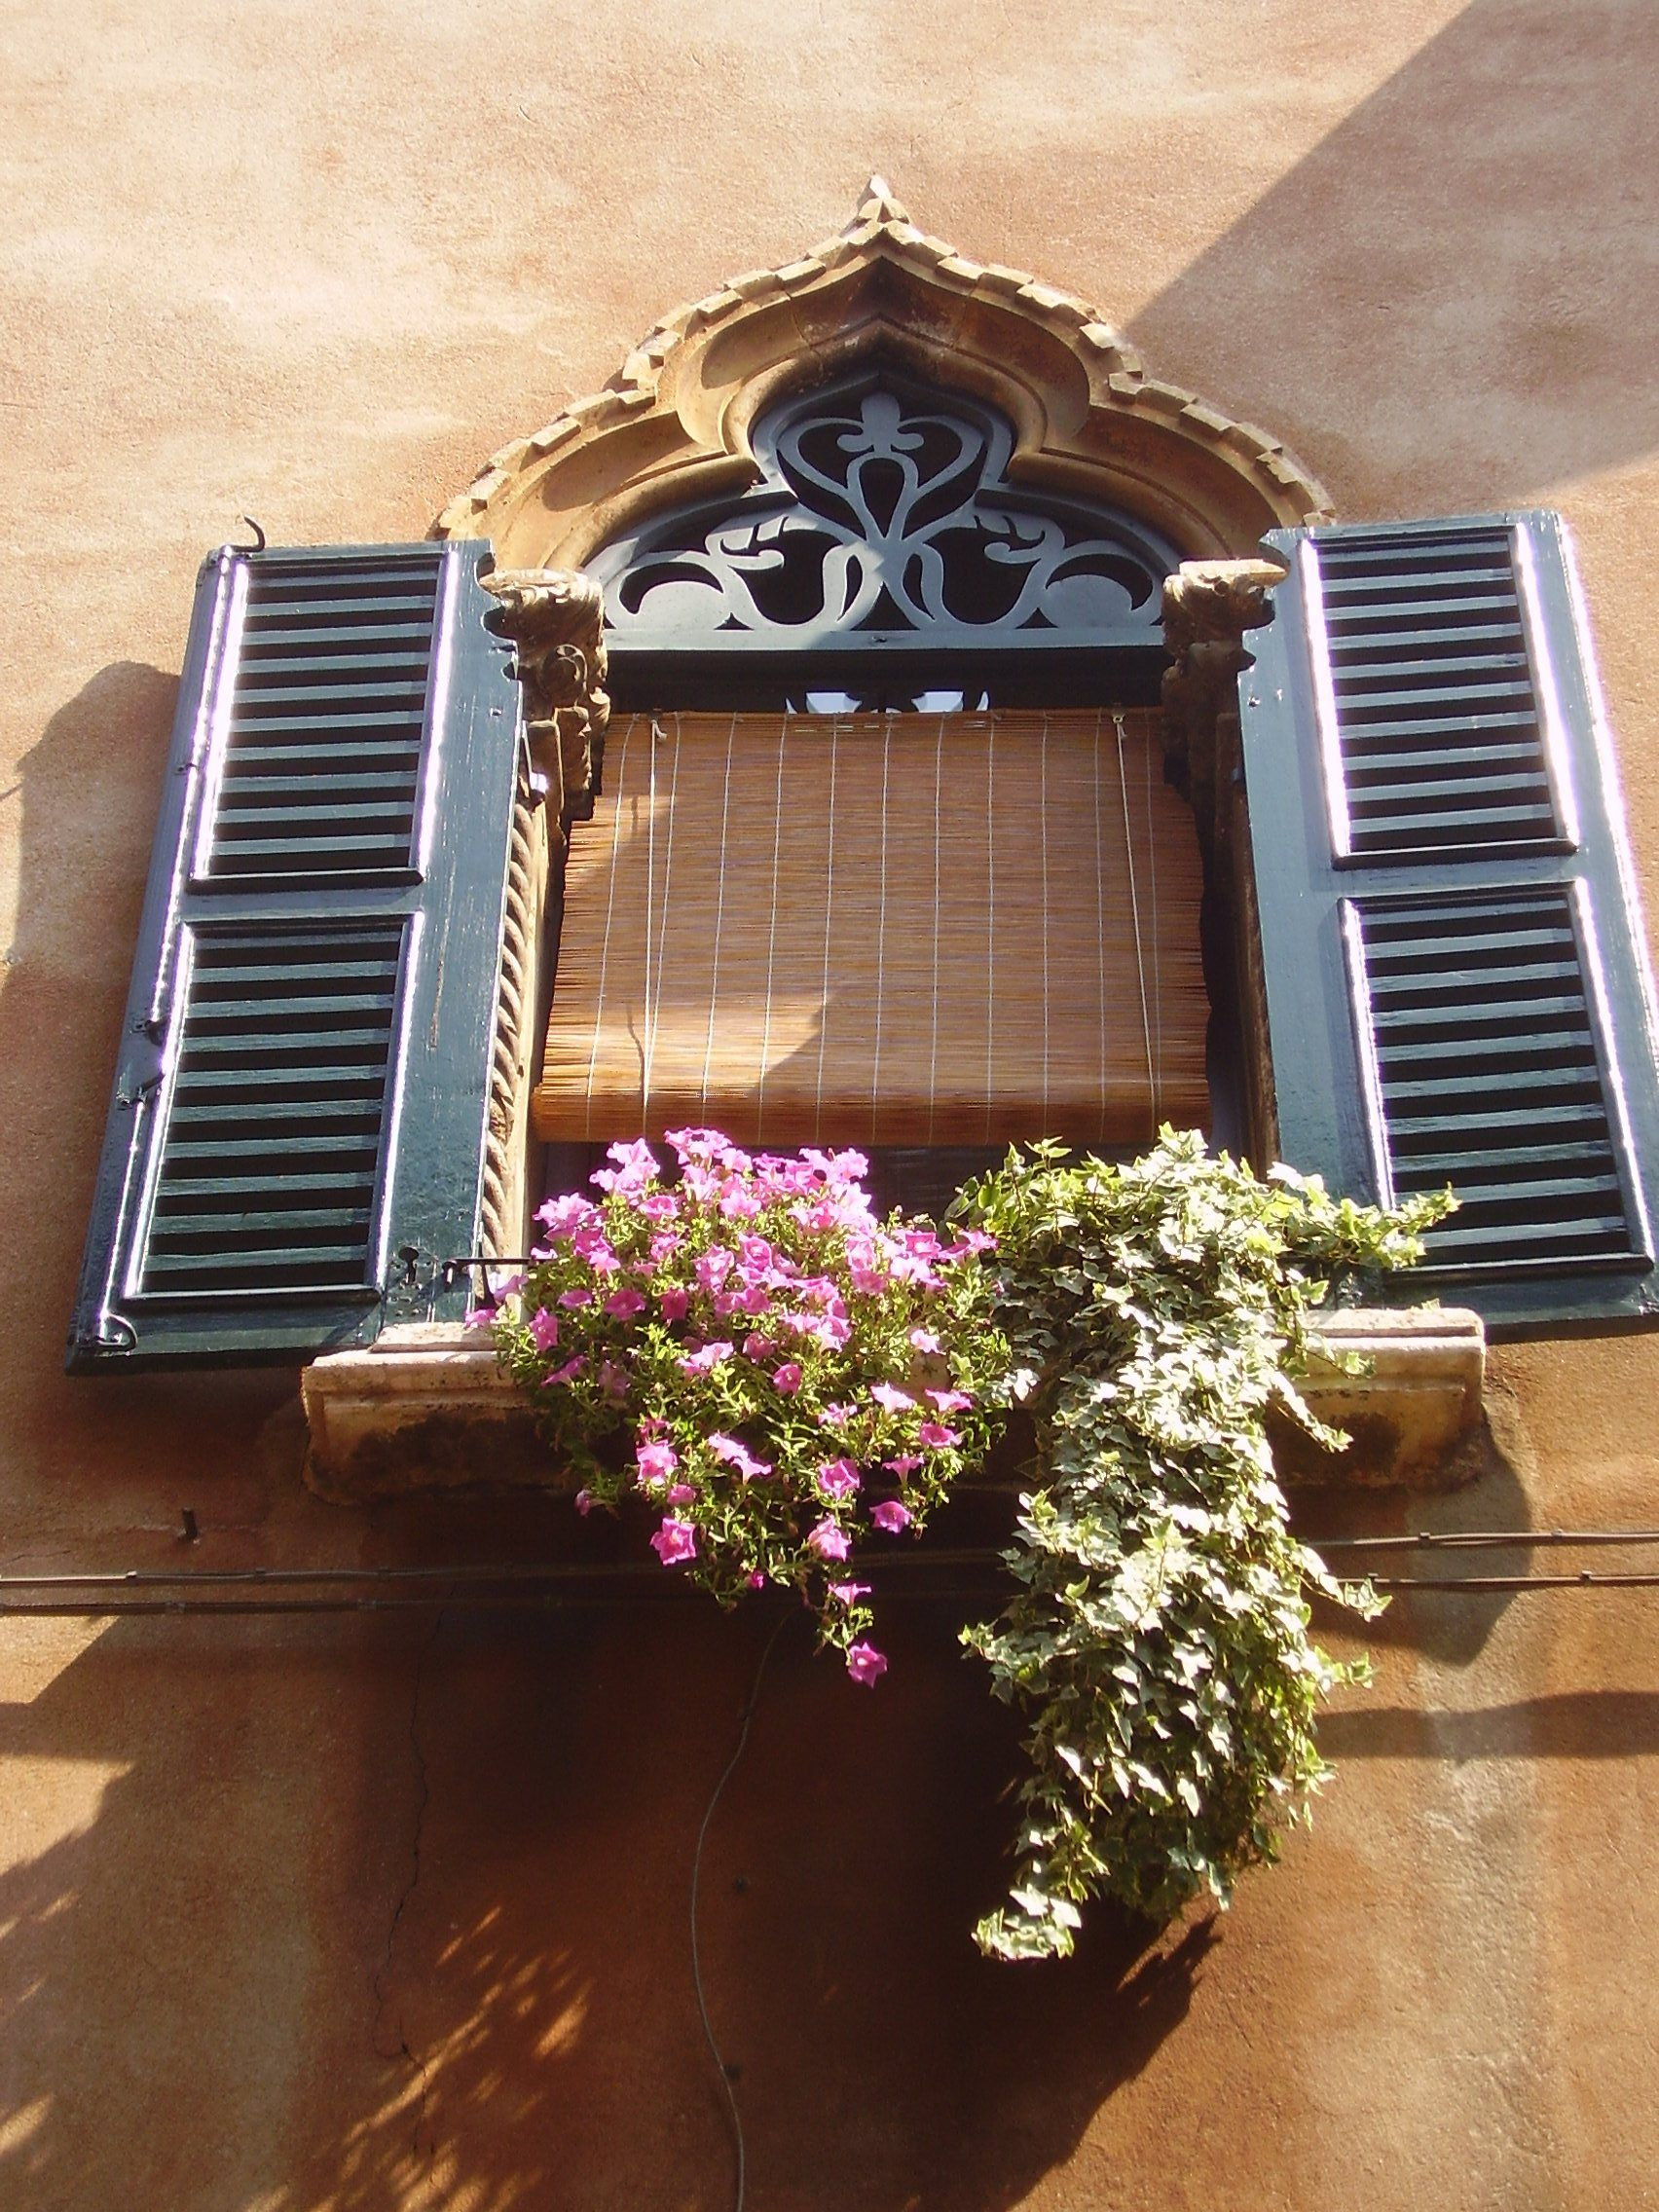 Verona Italy Window With Flowers Amy Barnett Photo